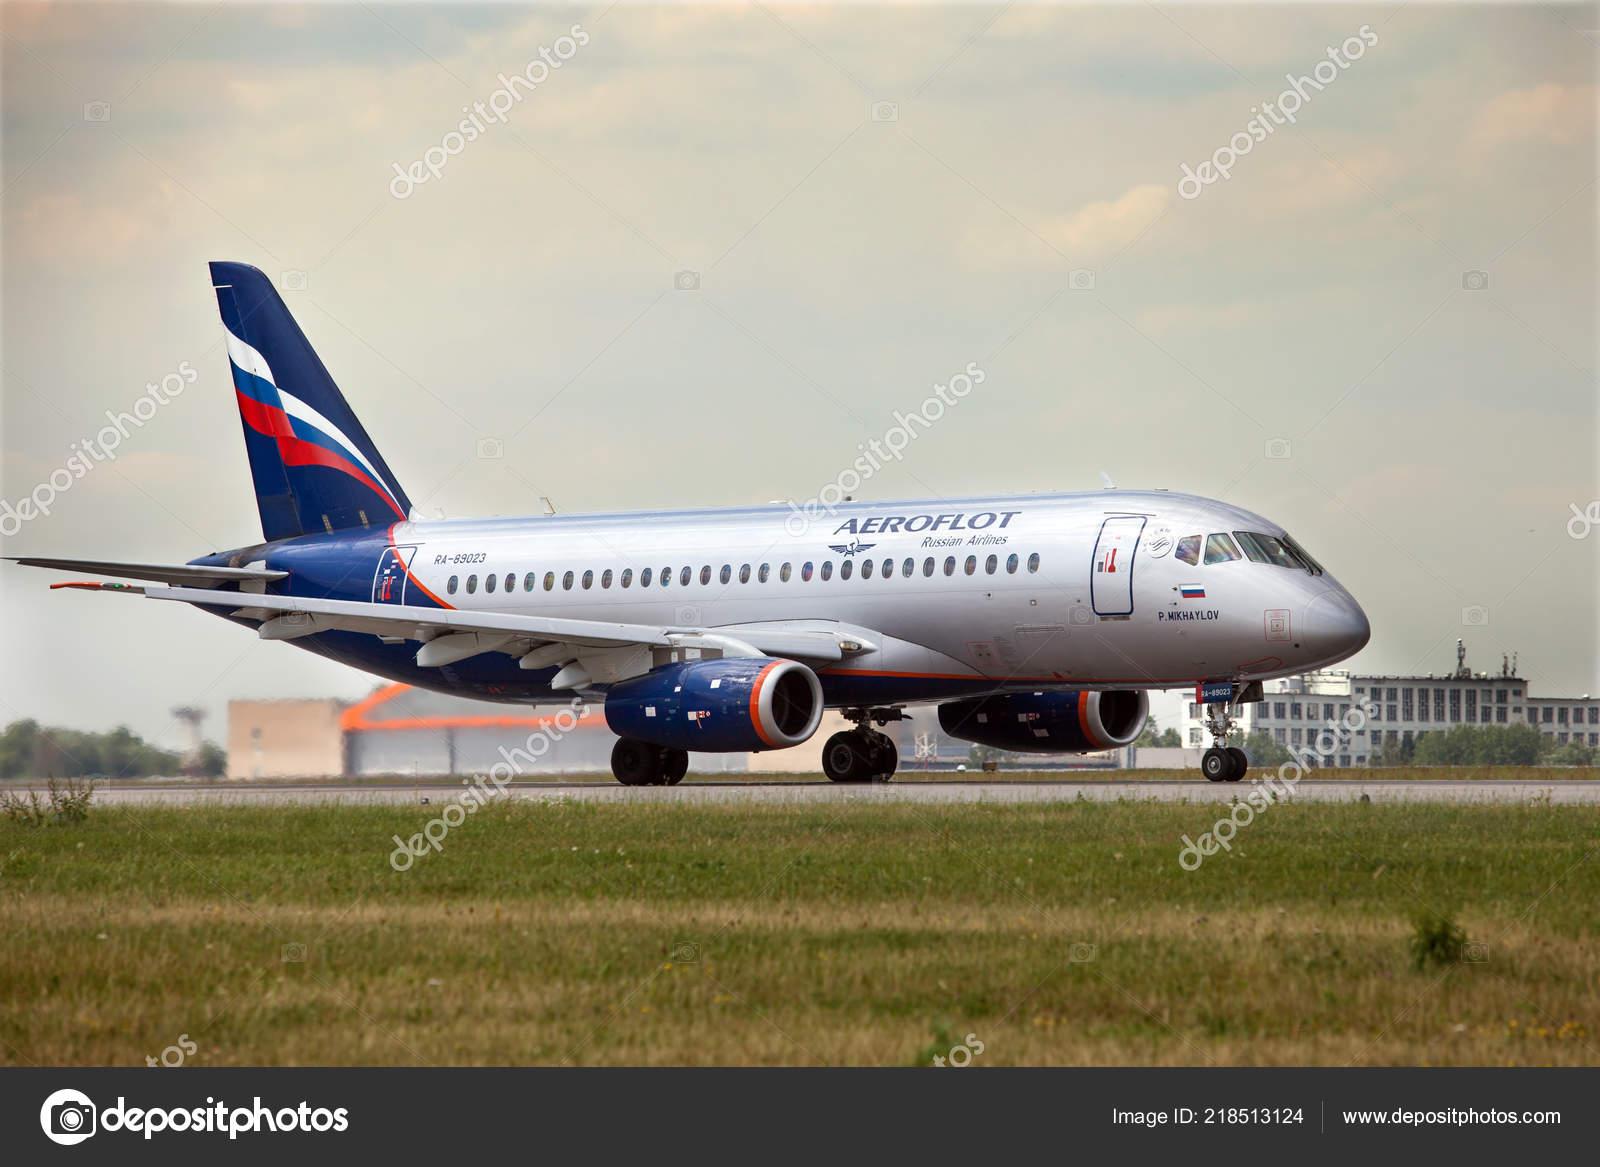 Moscow Russia June 2018 Airplane Ssj 100 Aeroflot Runway